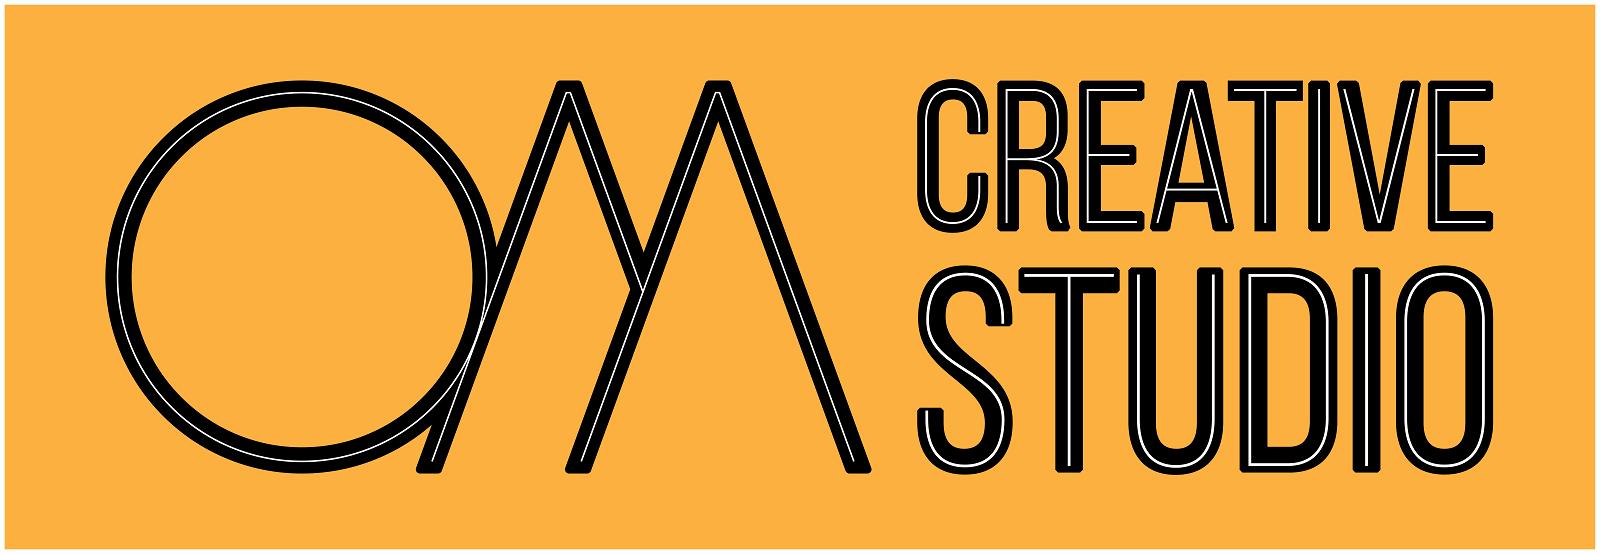 OM CREATIVE STUDIO